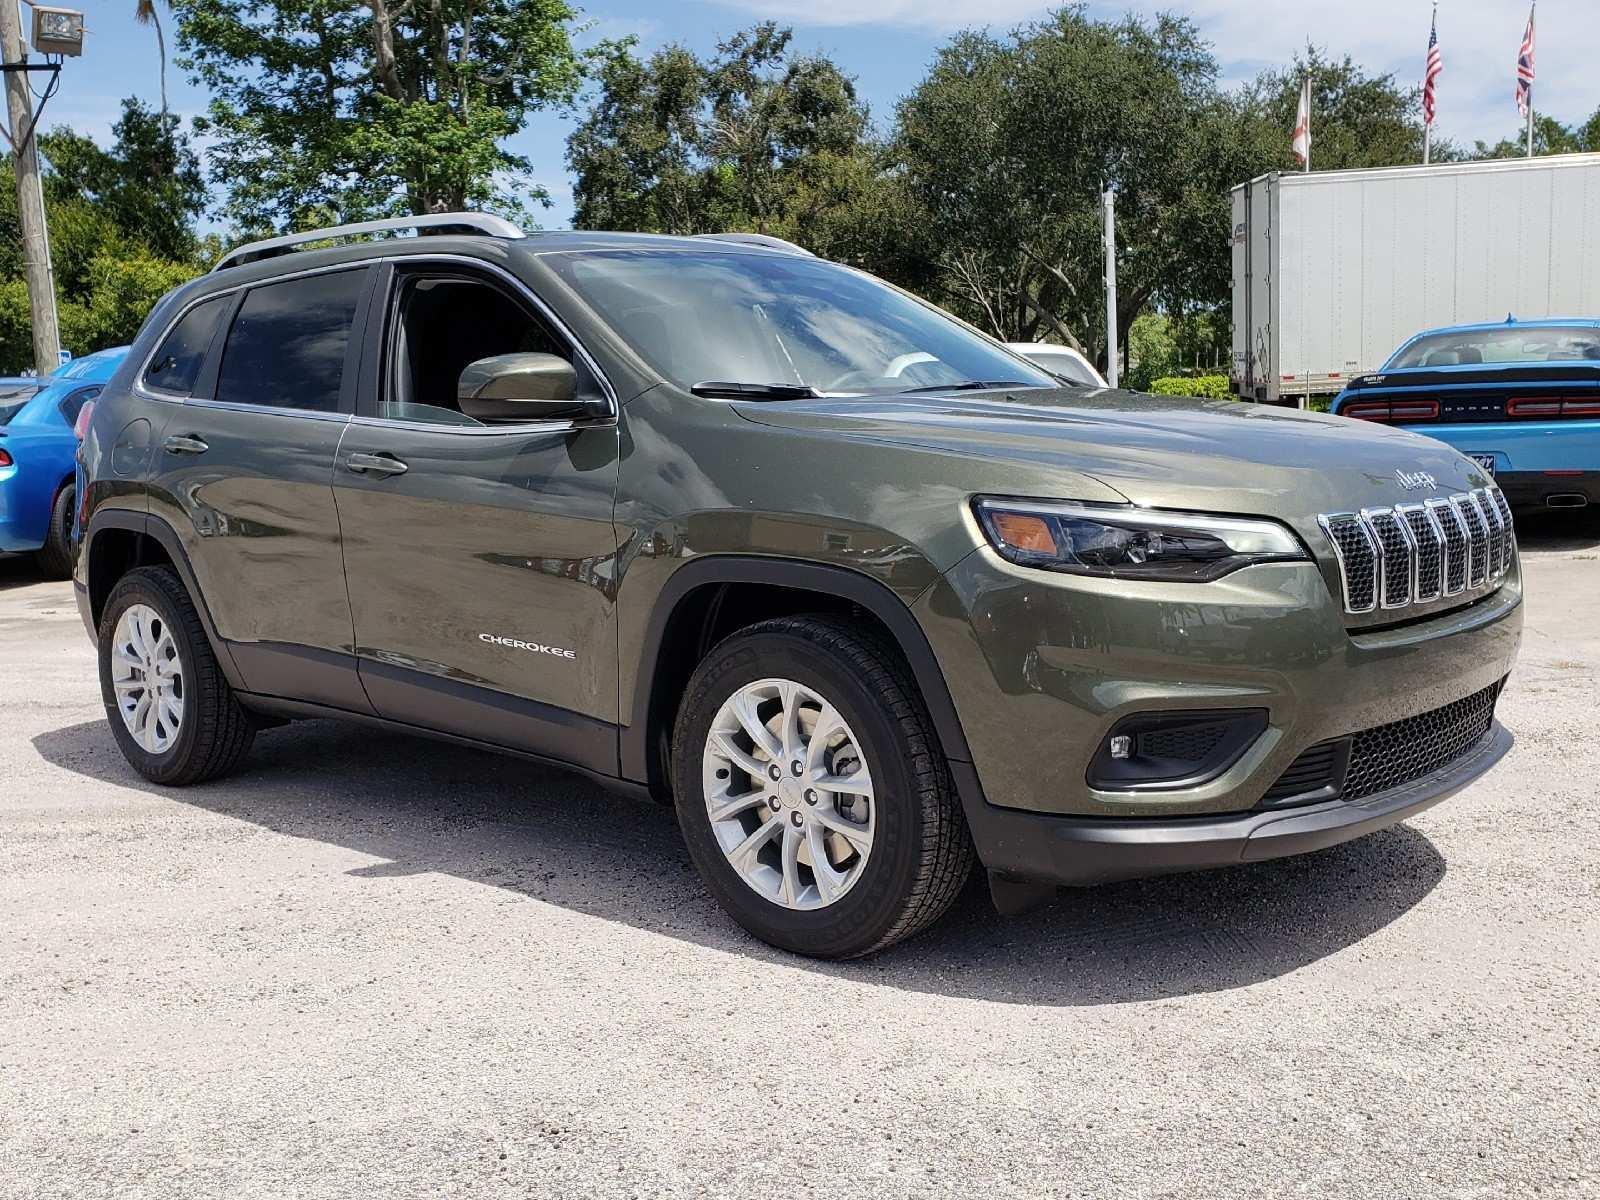 67 The Best Jeep Cherokee 2019 Anti Theft Code Exterior Exterior and Interior for Best Jeep Cherokee 2019 Anti Theft Code Exterior